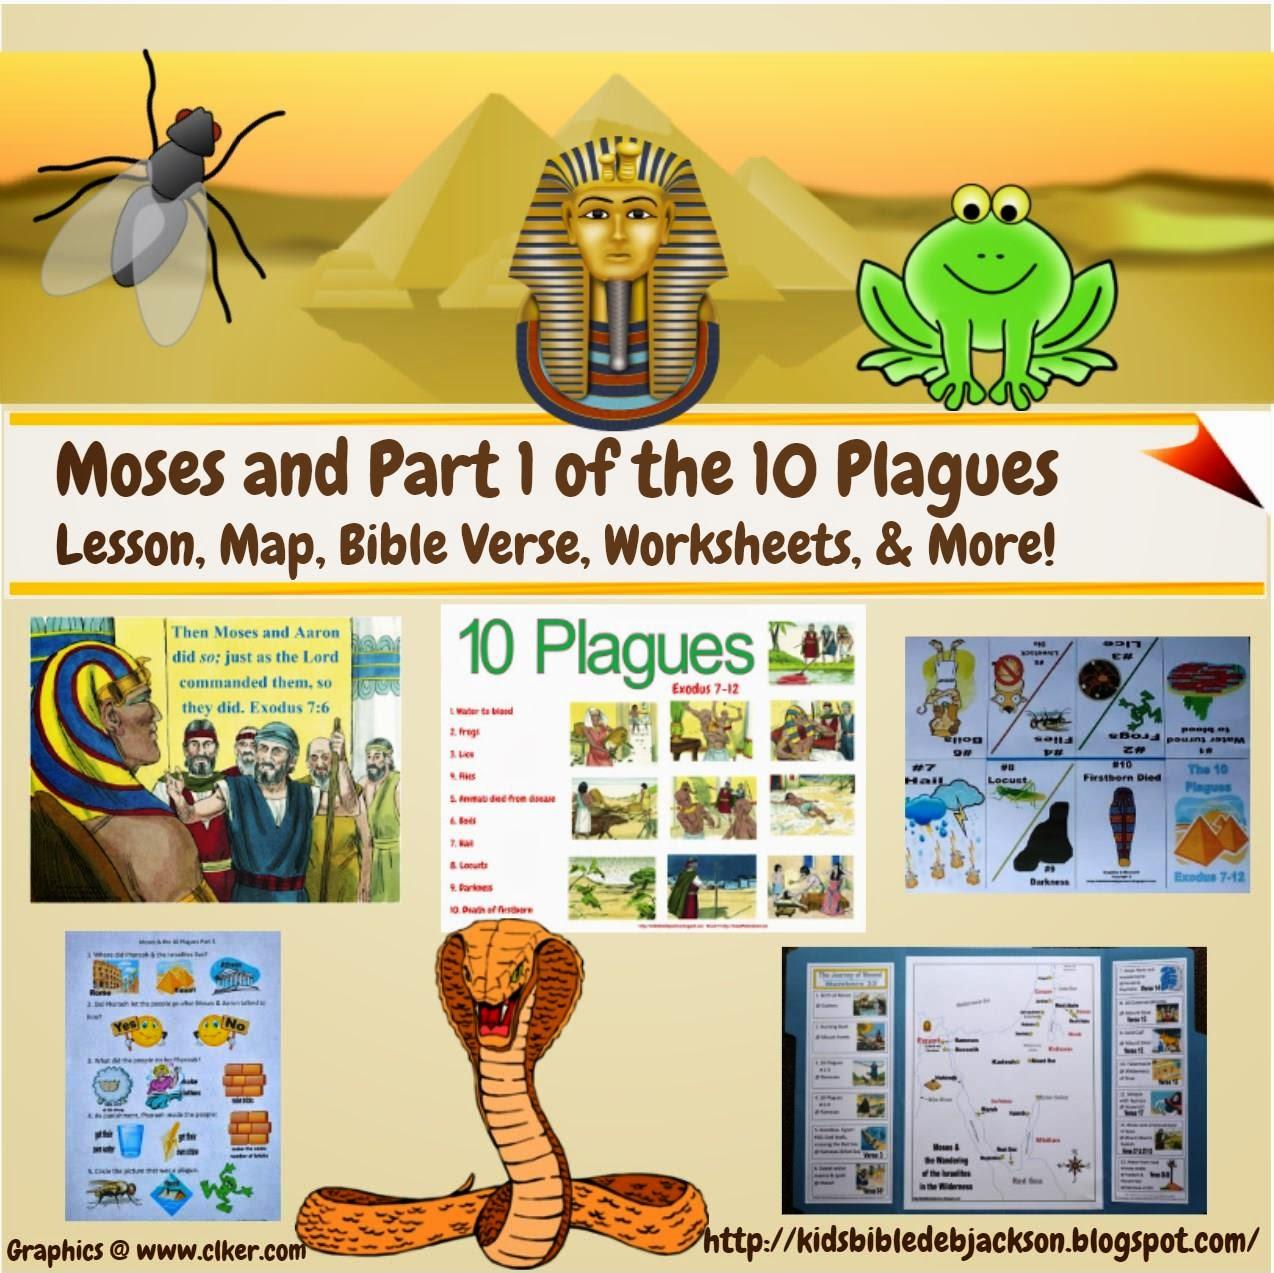 http://kidsbibledebjackson.blogspot.com/2013/09/moses-10-plagues-part-1-of-3.html